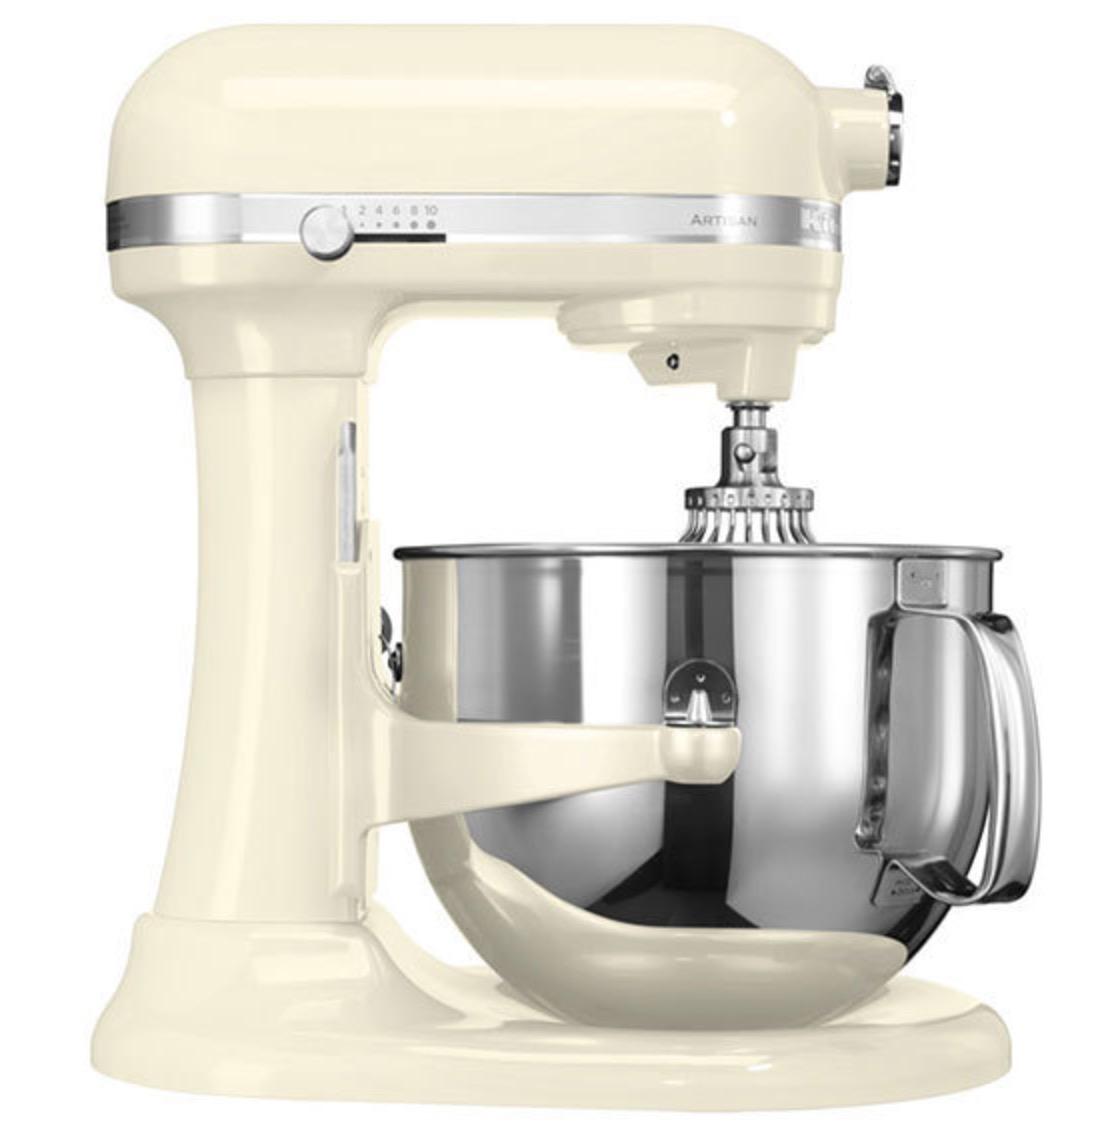 KitchenAid Artisan 5KSM7580XEAC Küchenmaschine Crème ab 595,98 Euro + 152,20 Euro in Superpunkten